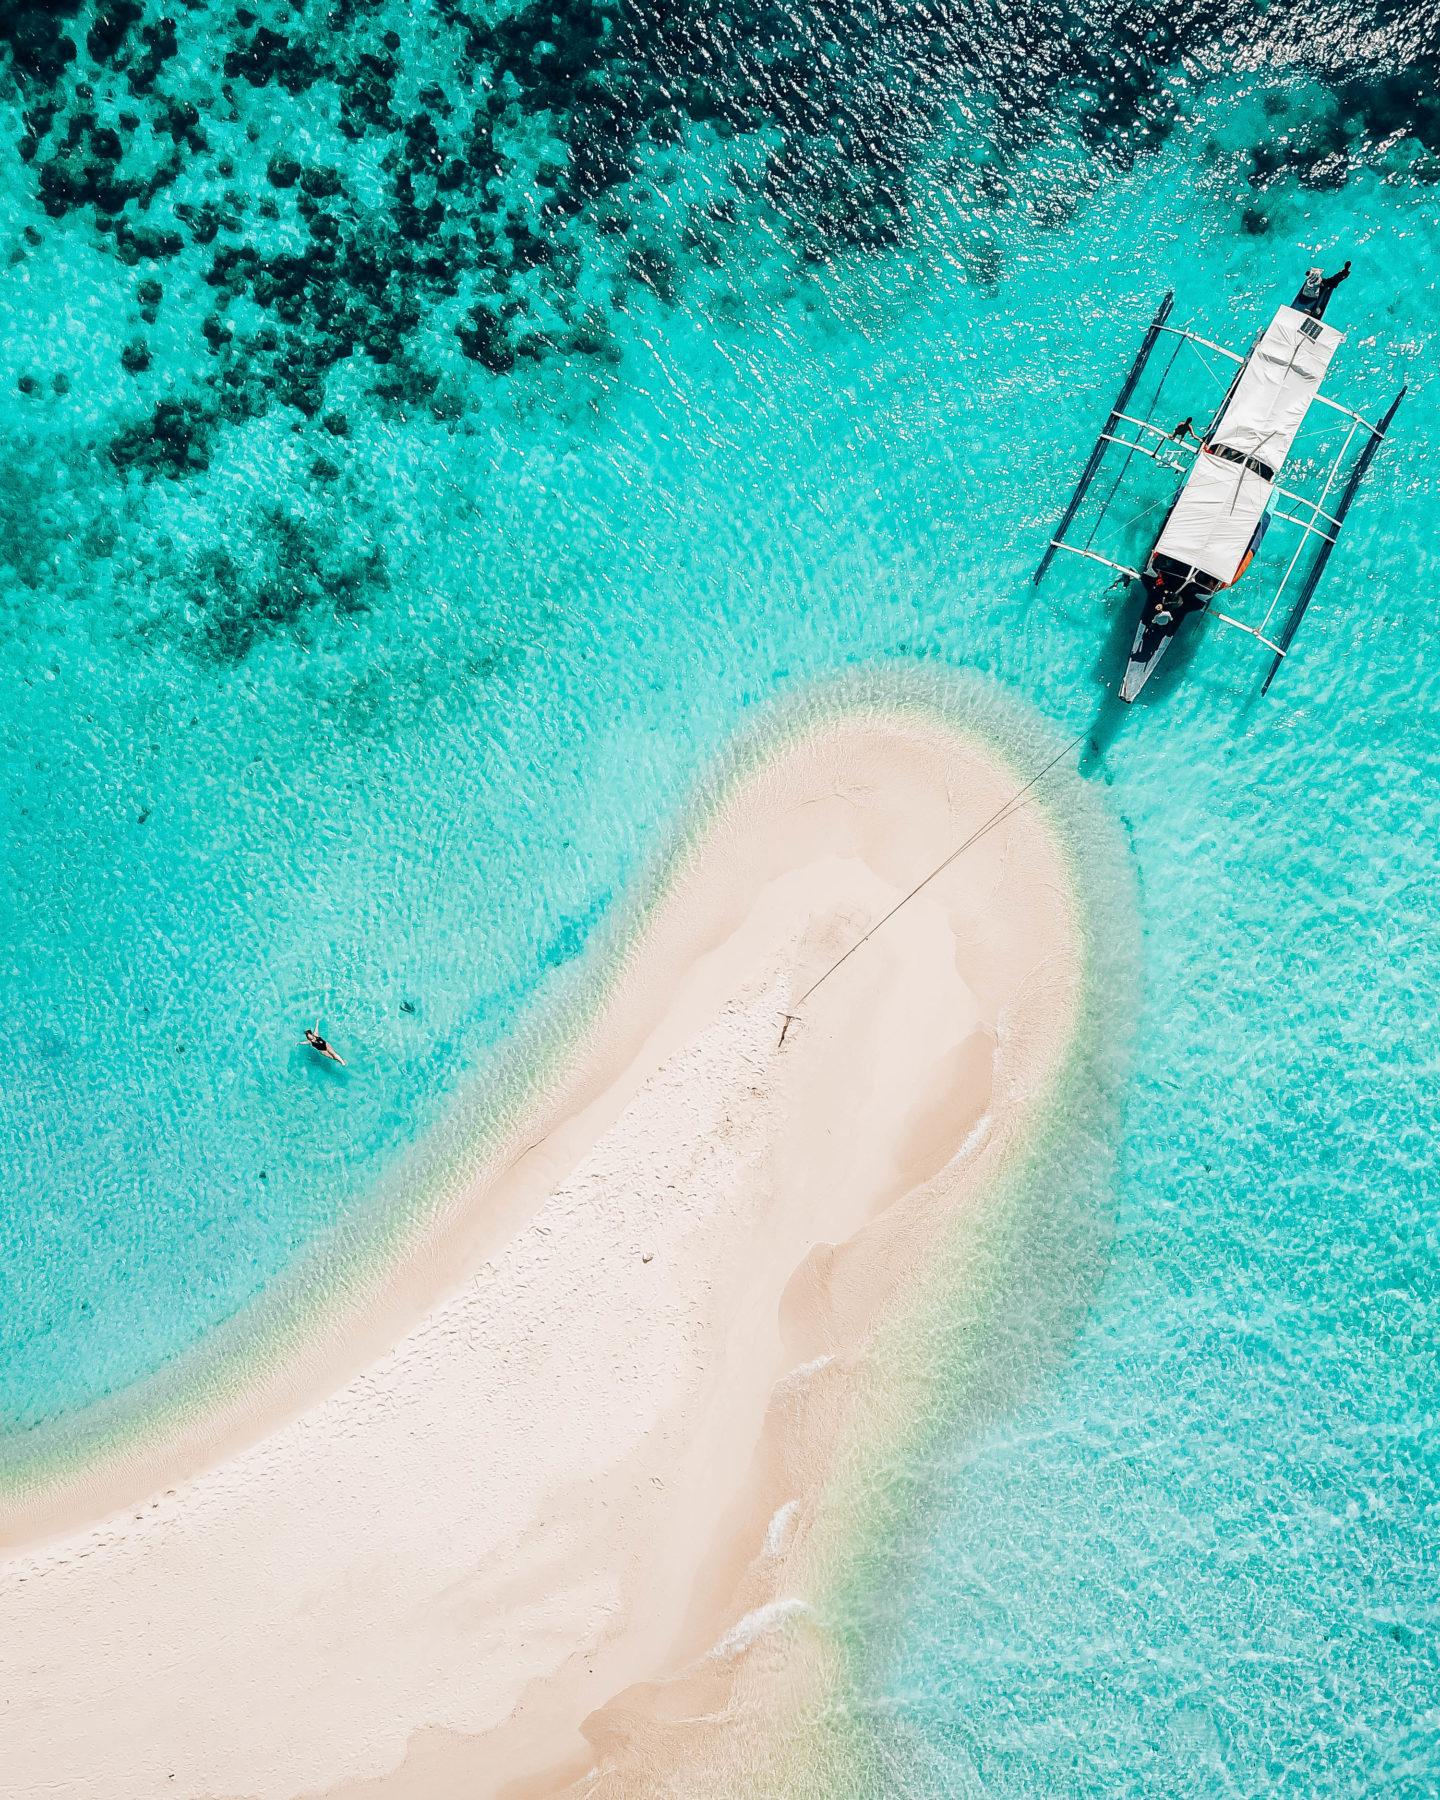 aerial photo of Ditaytayan Island Sandbar with woman in water